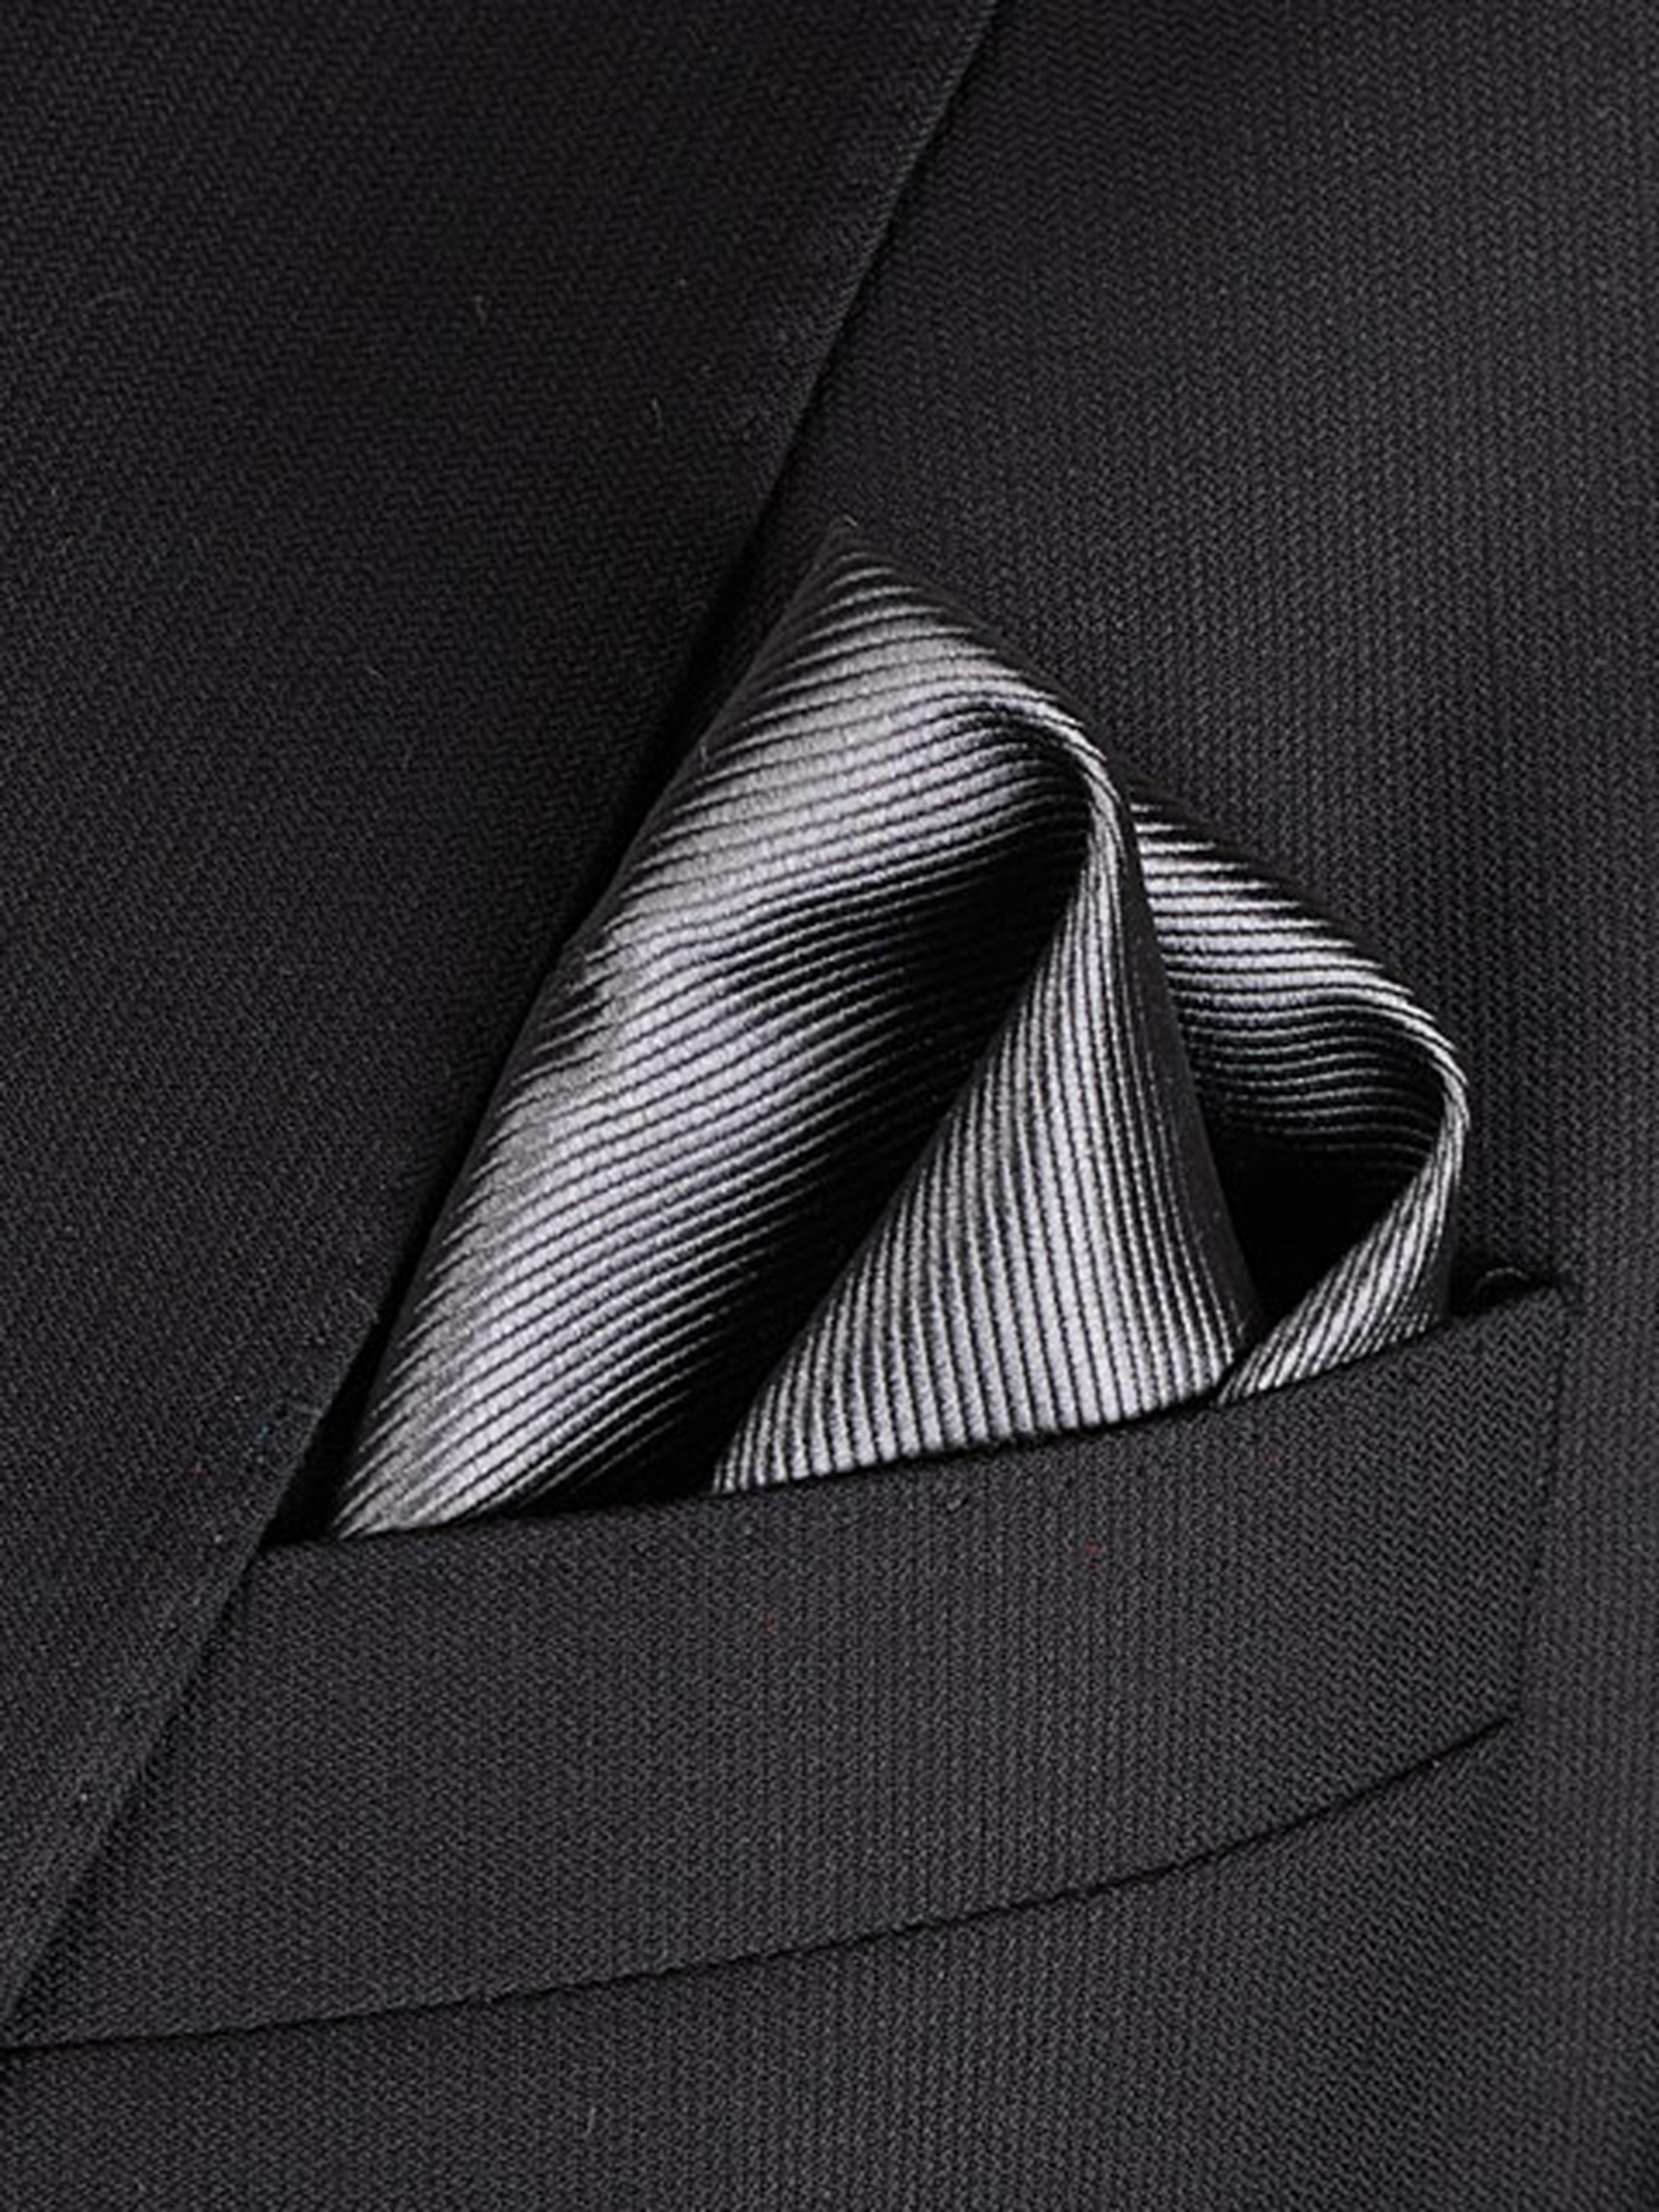 Pocket Square Silk Dark Grey F53